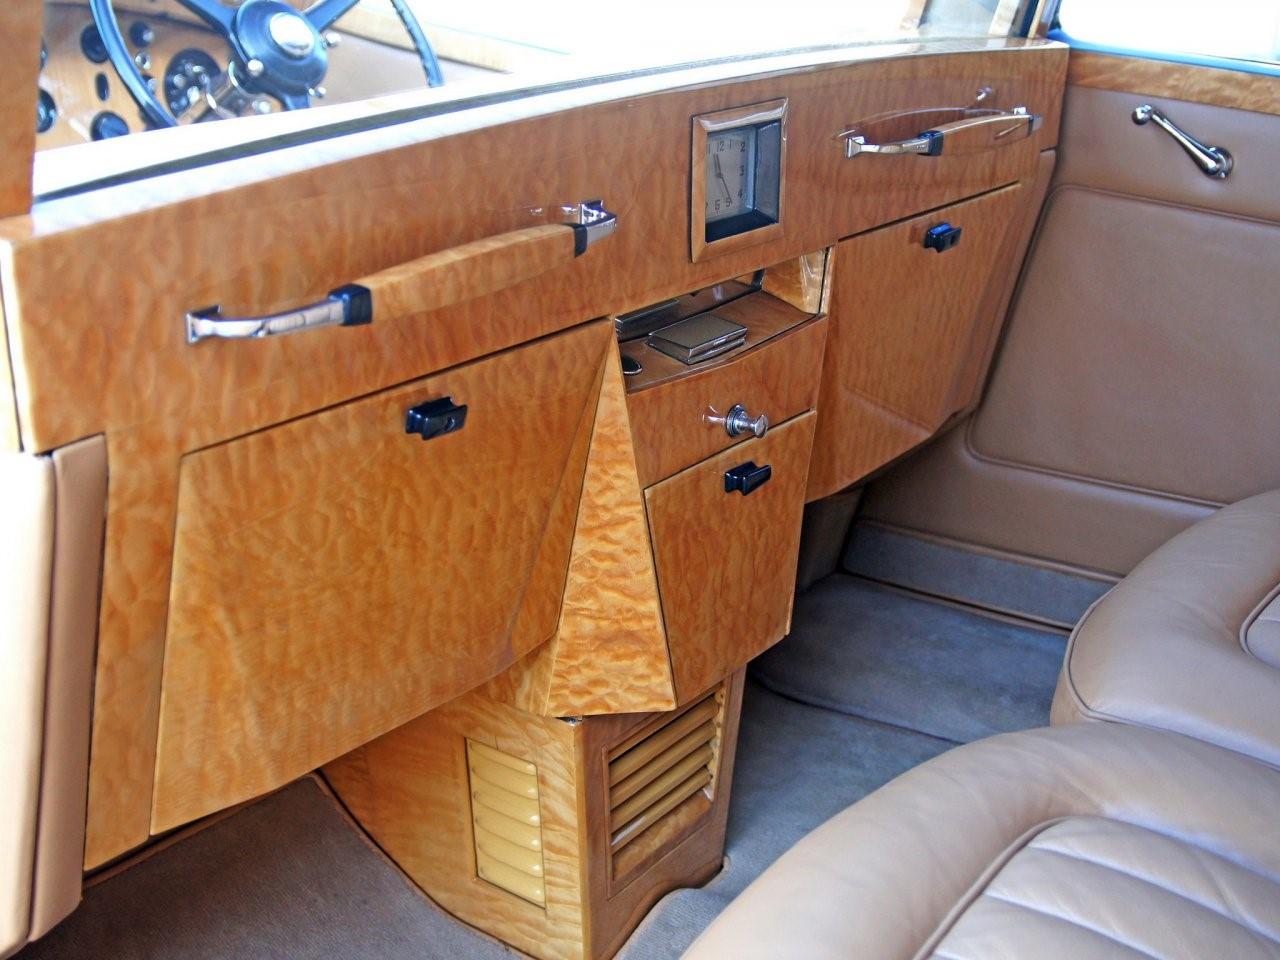 1938 Rolls Royce Phantom III Sedanca deVille Park Ward 4